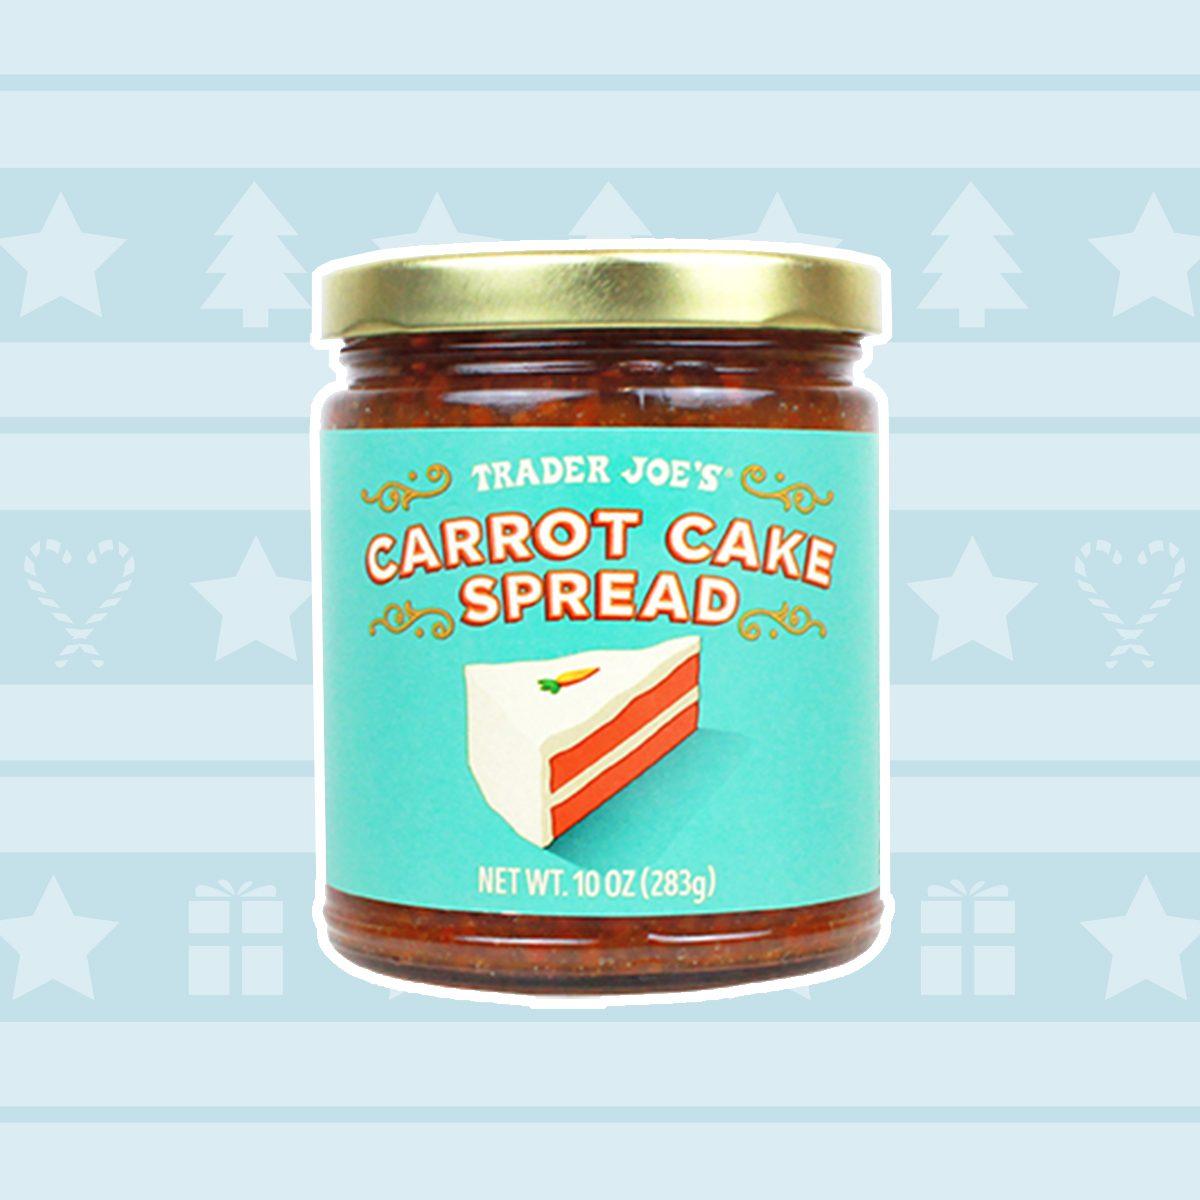 Carrot Cake Spread